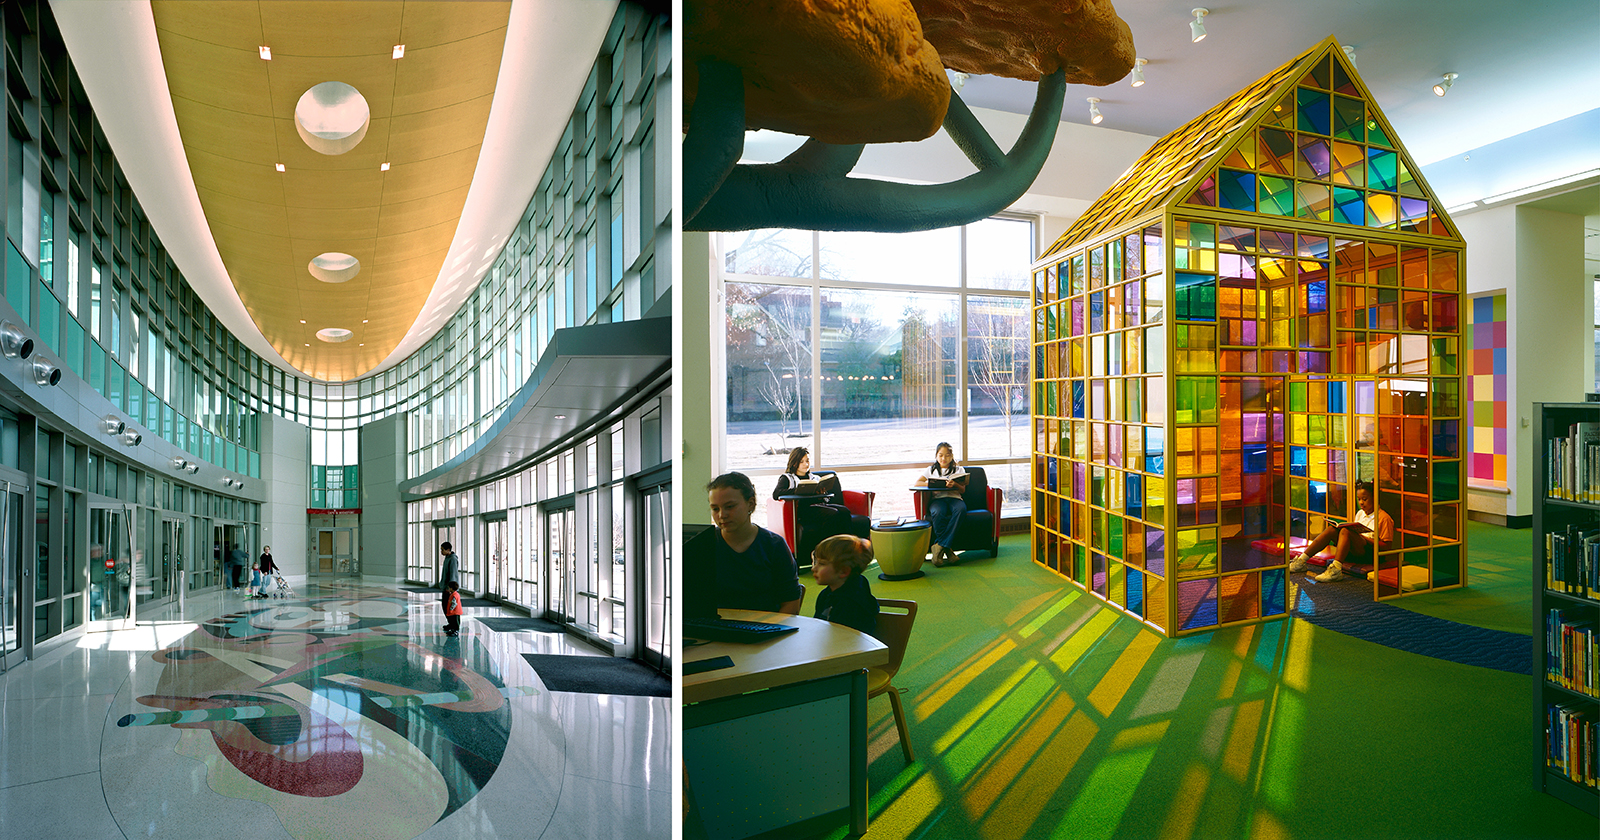 Memphis/Shelby County Public Library, Memphis, TN